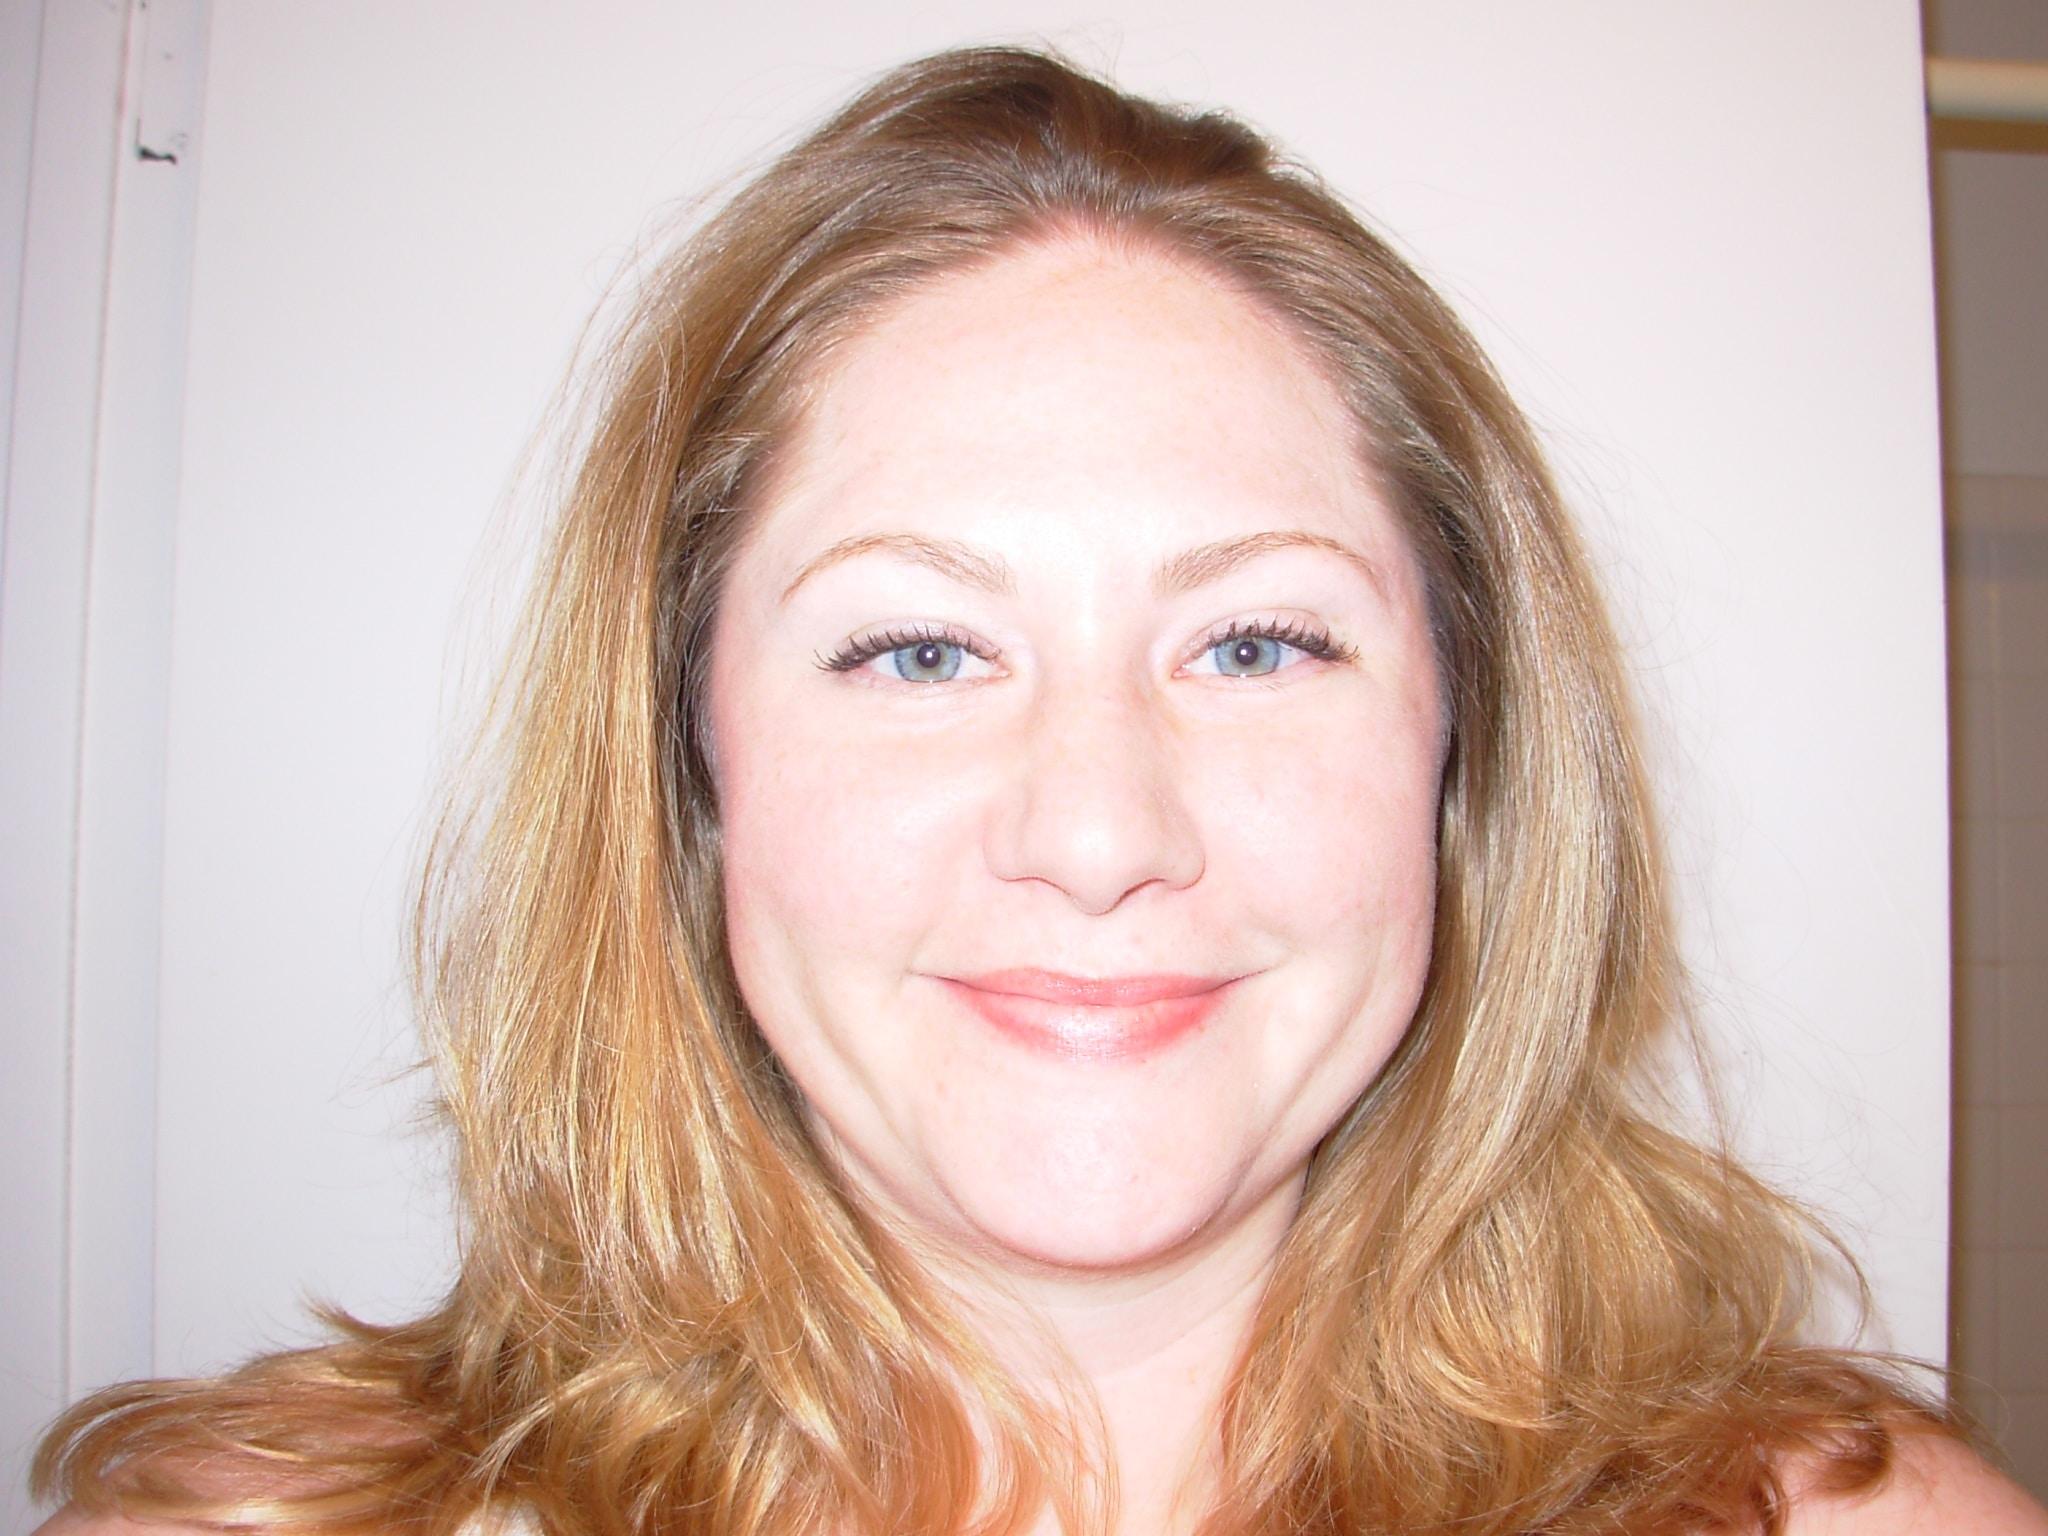 Go to Jolene Desmond's profile